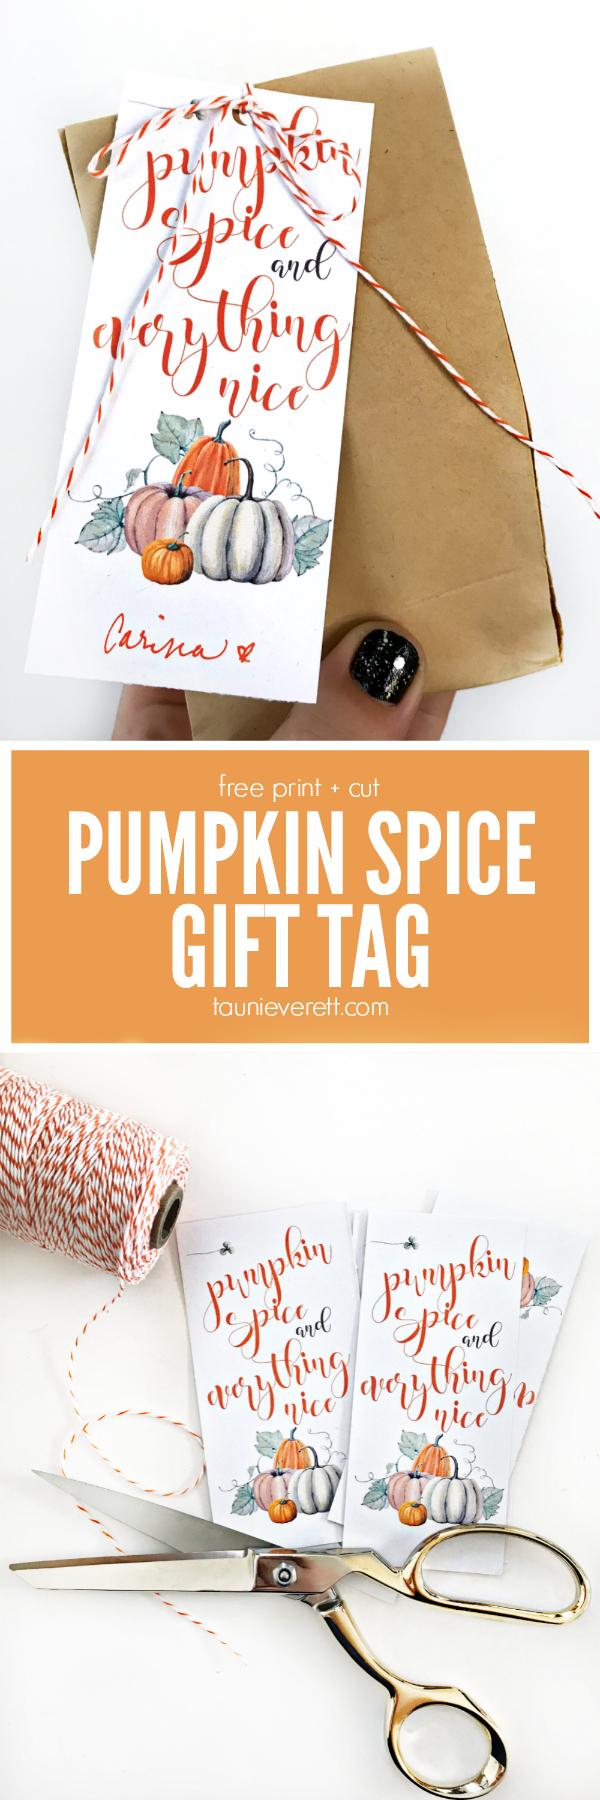 Free Print And Cut Pumpkin Spice Gift Tag #pumpkin #pumpkinspice - Free Printable Pumpkin Gift Tags